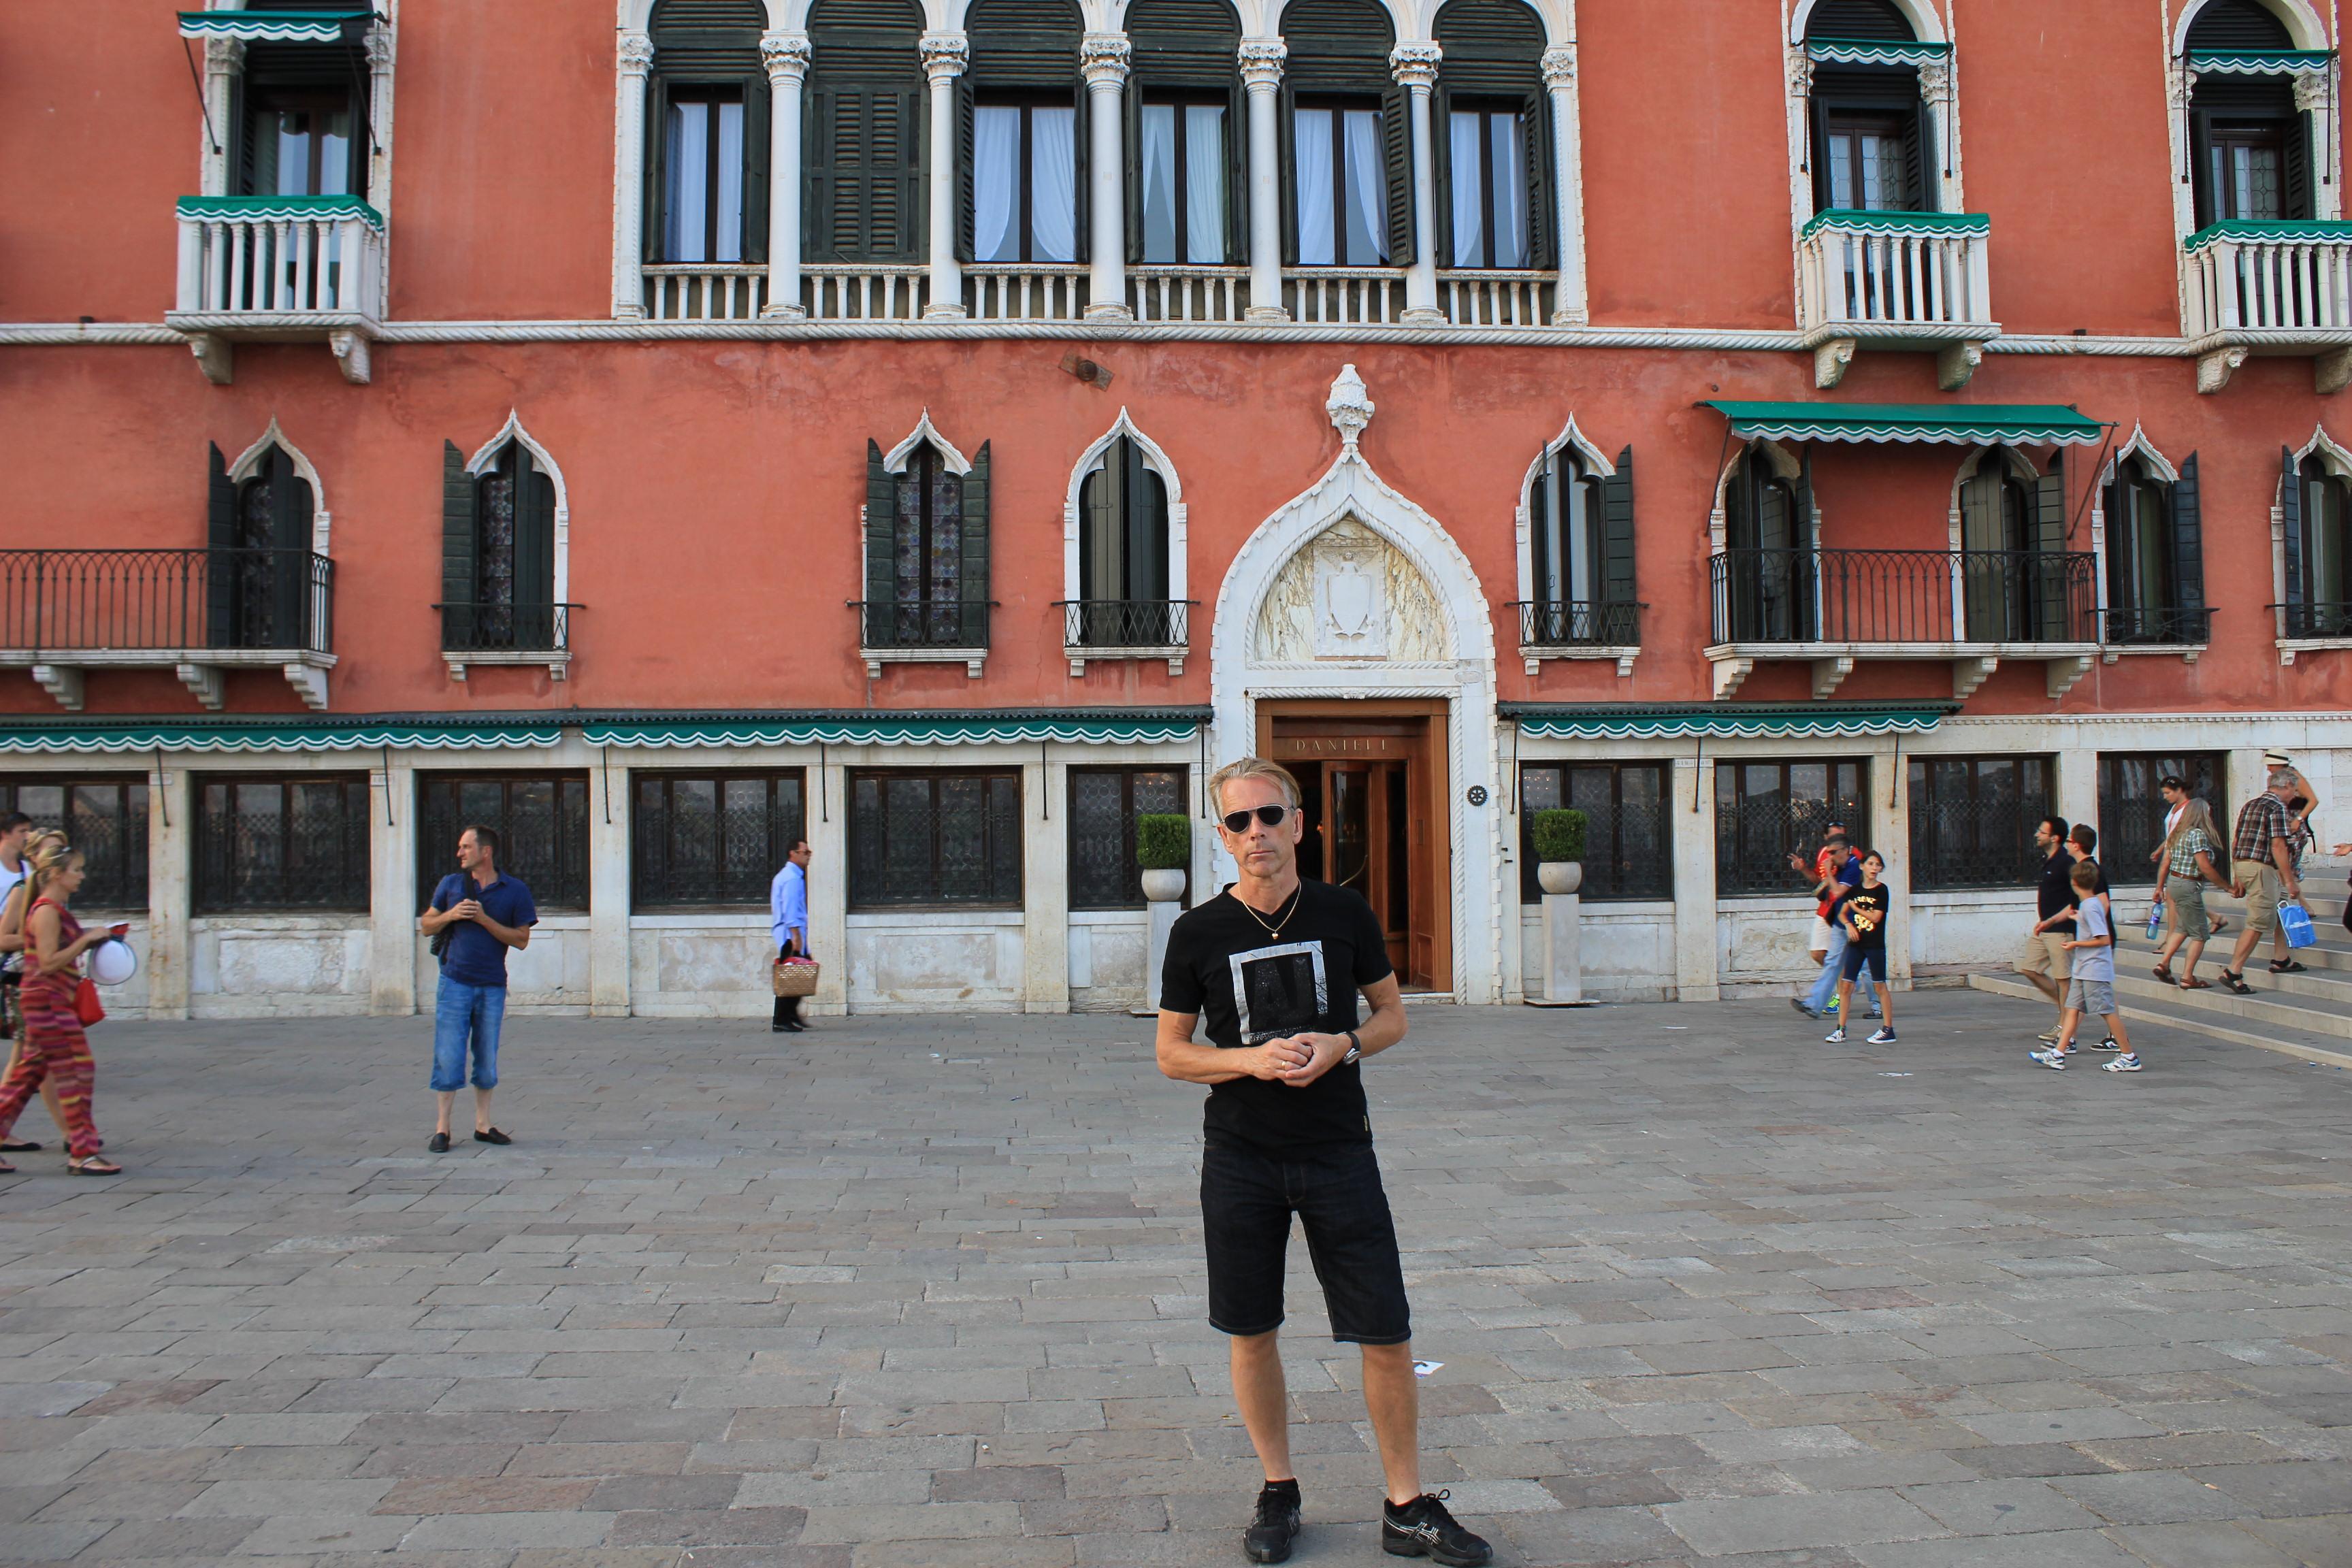 casino royale locations italy